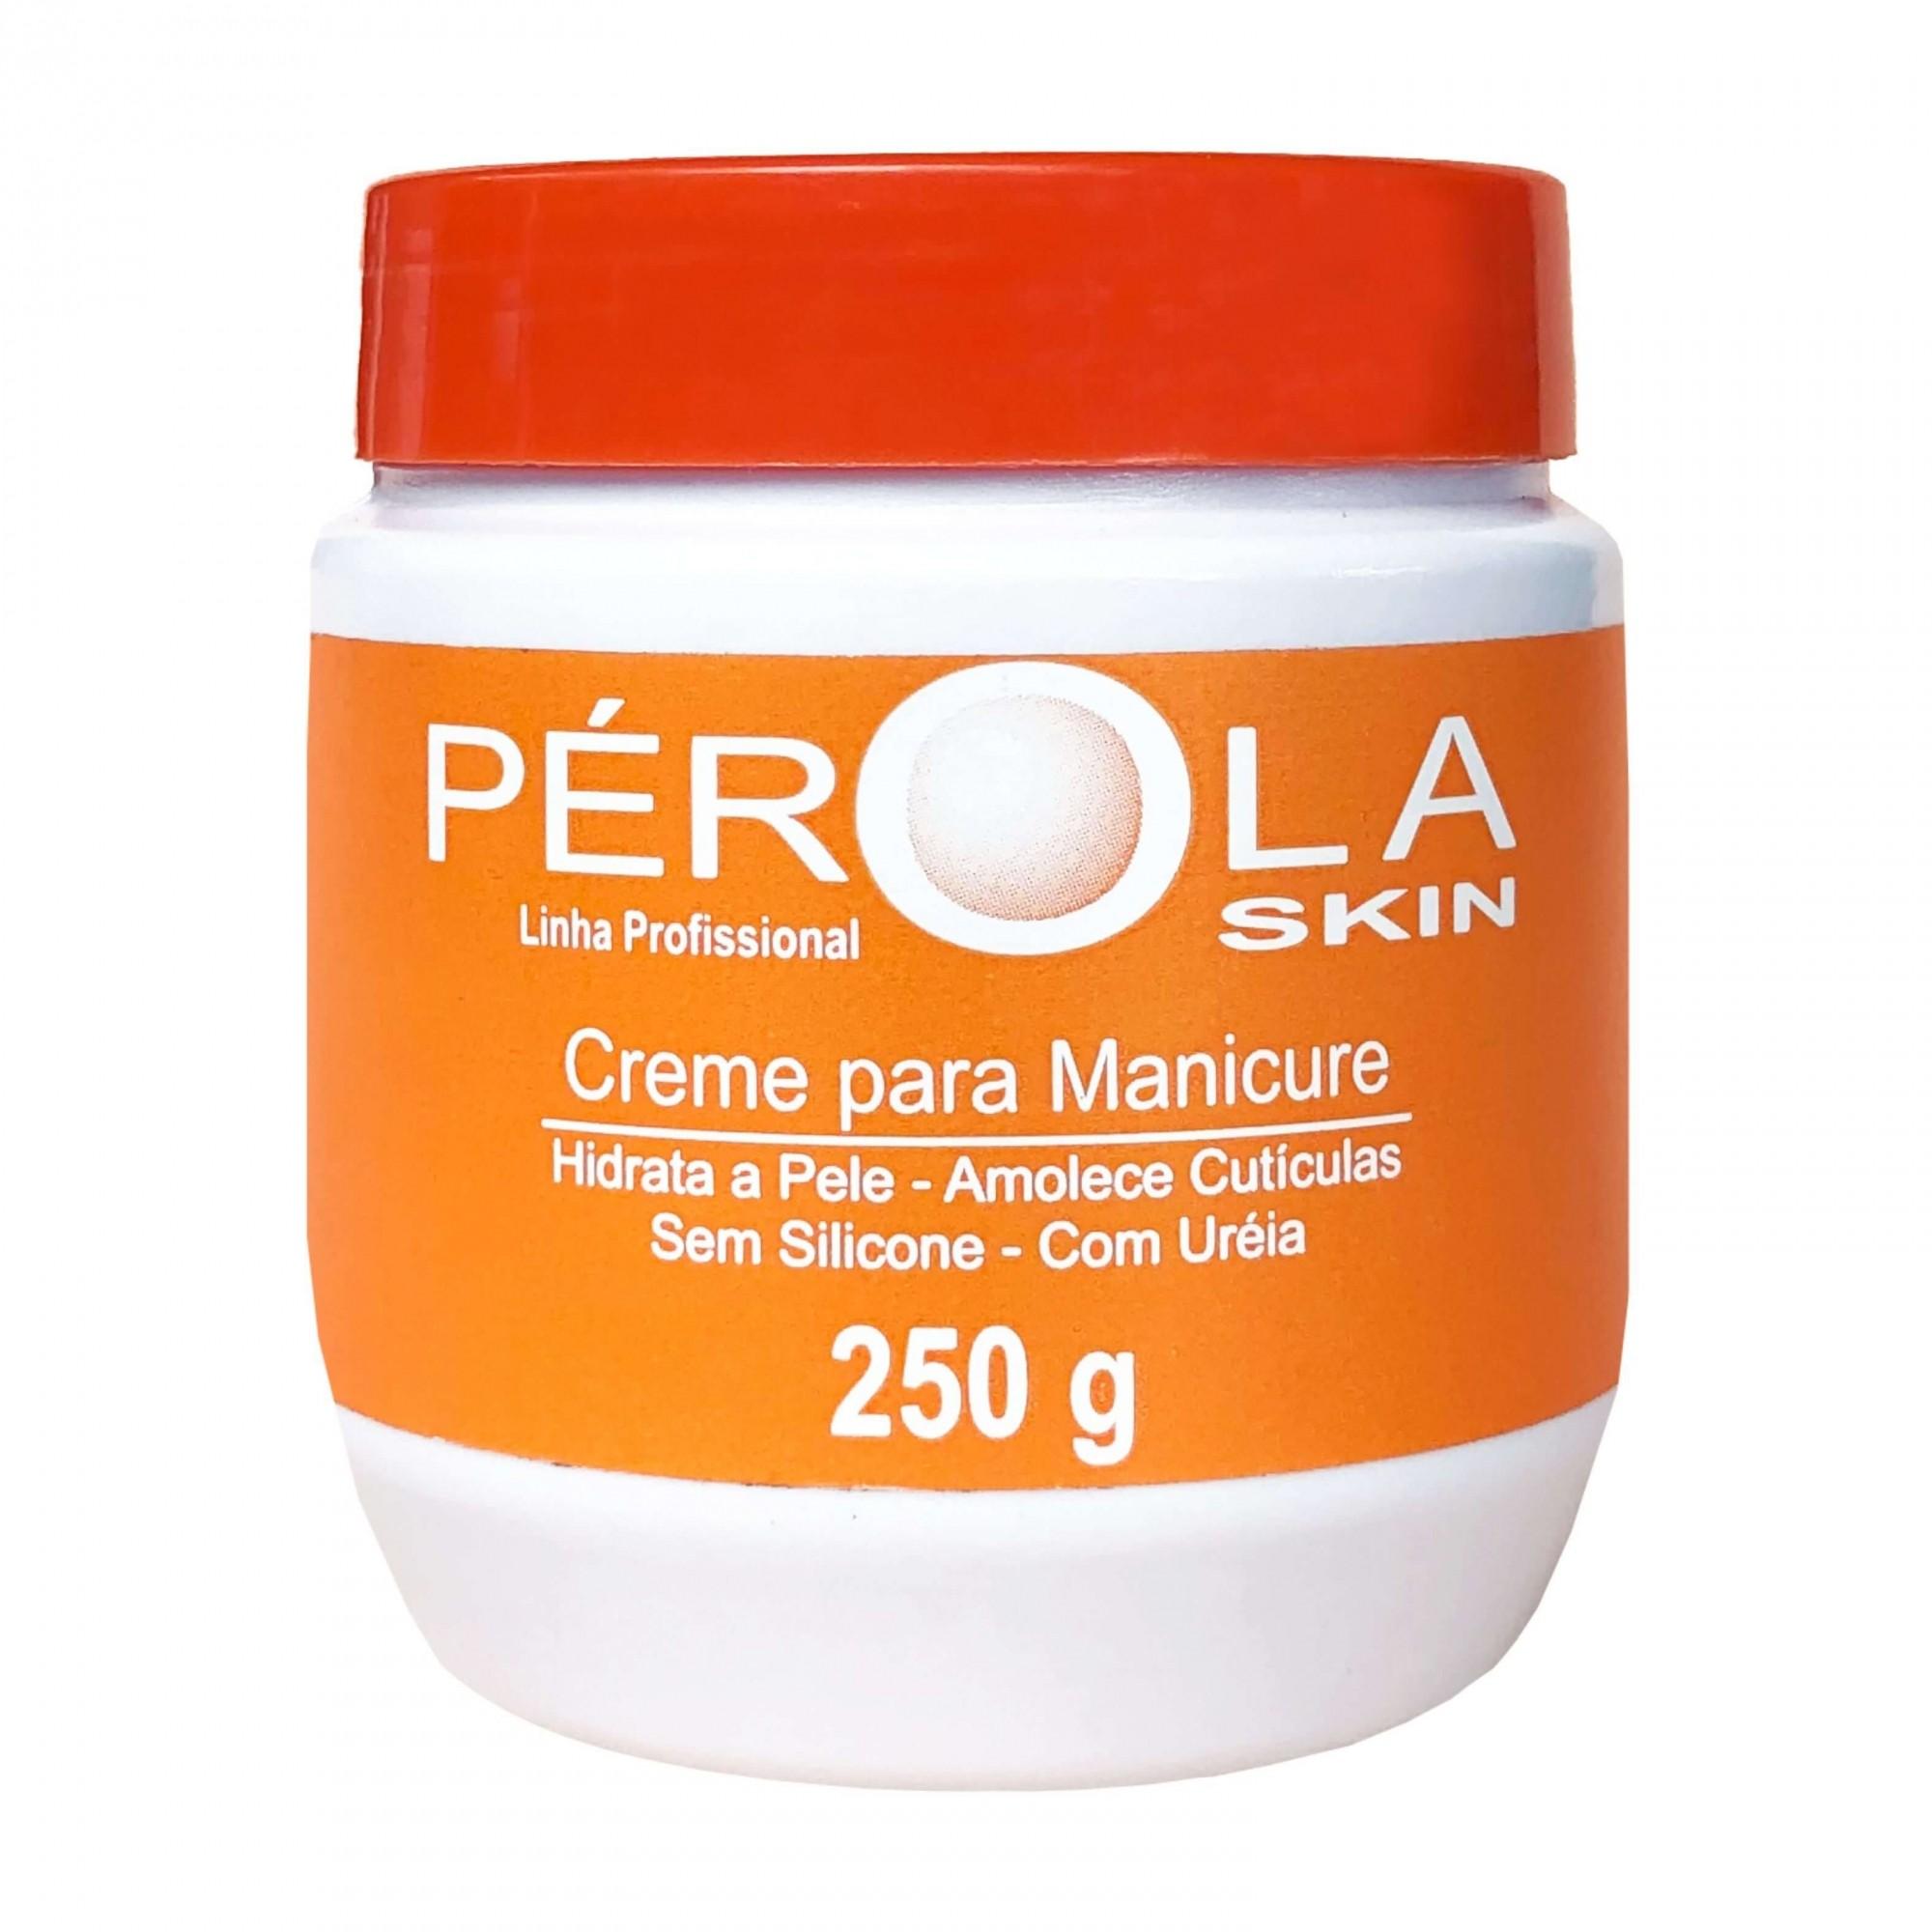 Creme para Manicure Pérola Skin 250g